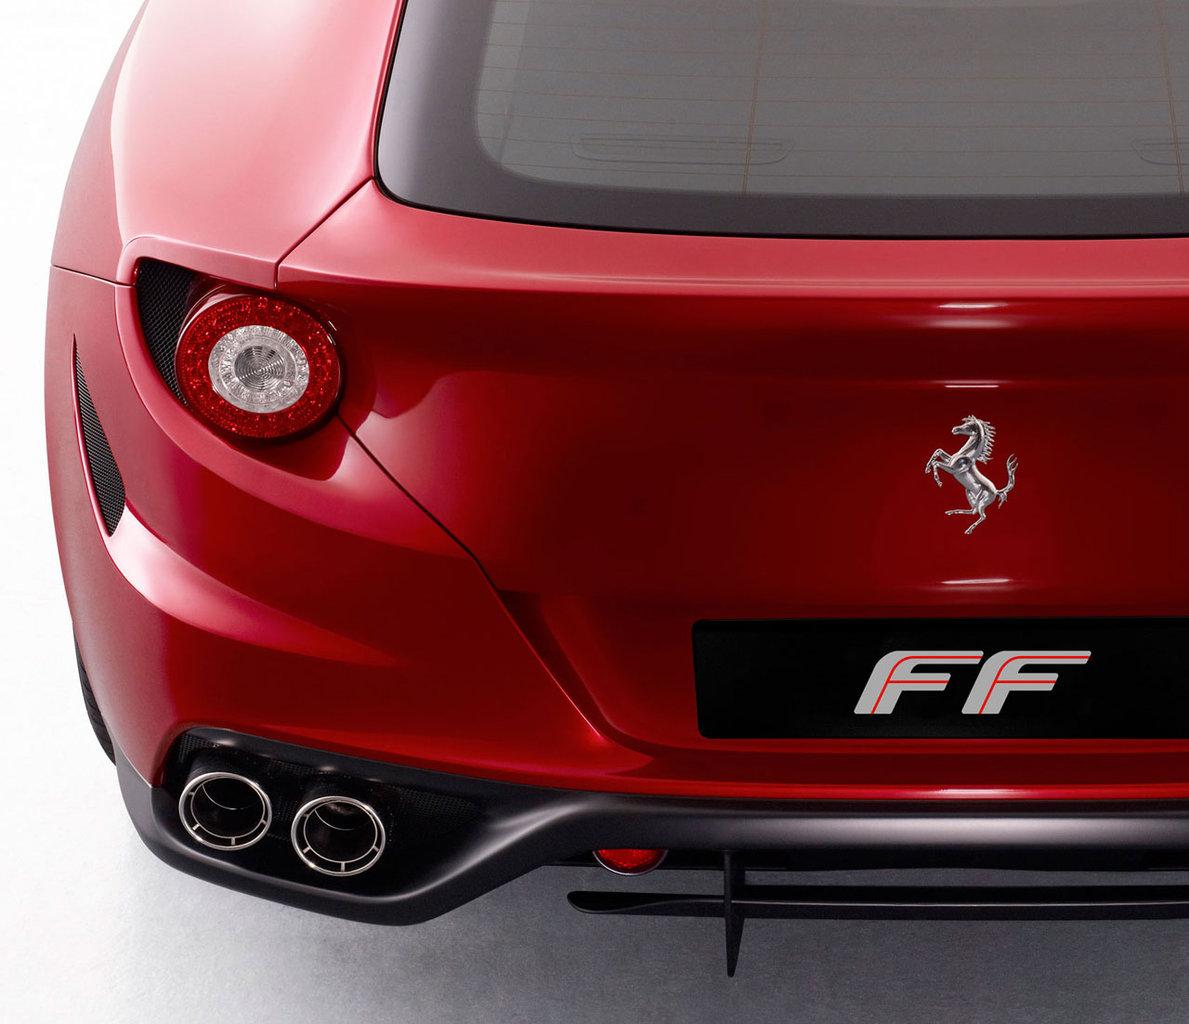 FF new fantastic four-seat